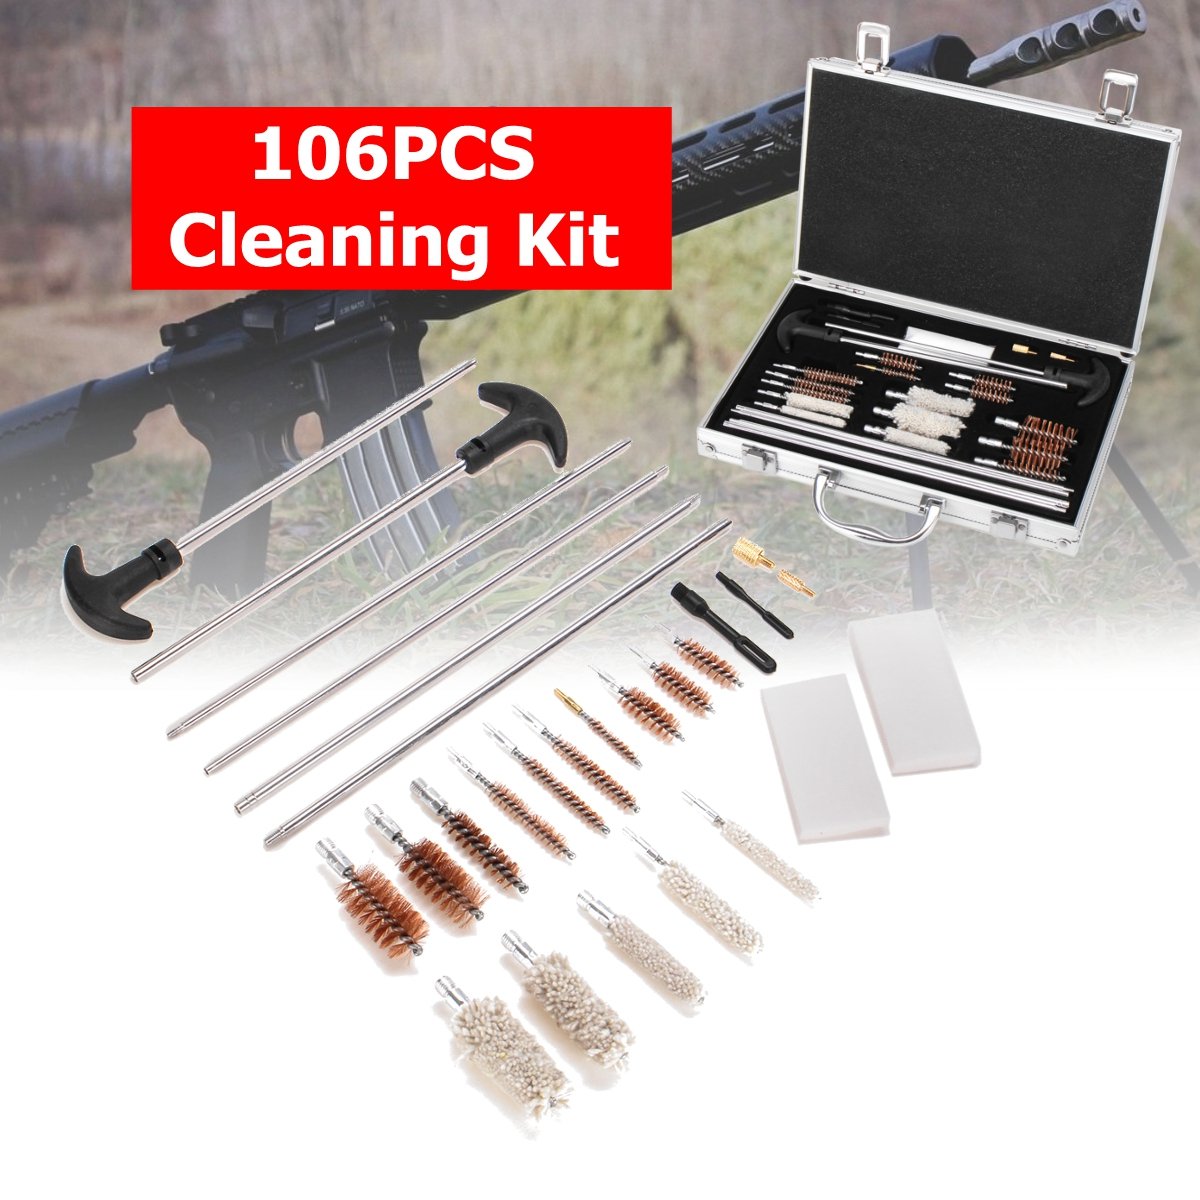 106Pcs Universal Gun Cleaning Tool Kit Rifle Handgun Shotgun Firearm Cleaner Pistol Pipe Mop Brush Accessory with Carry Case